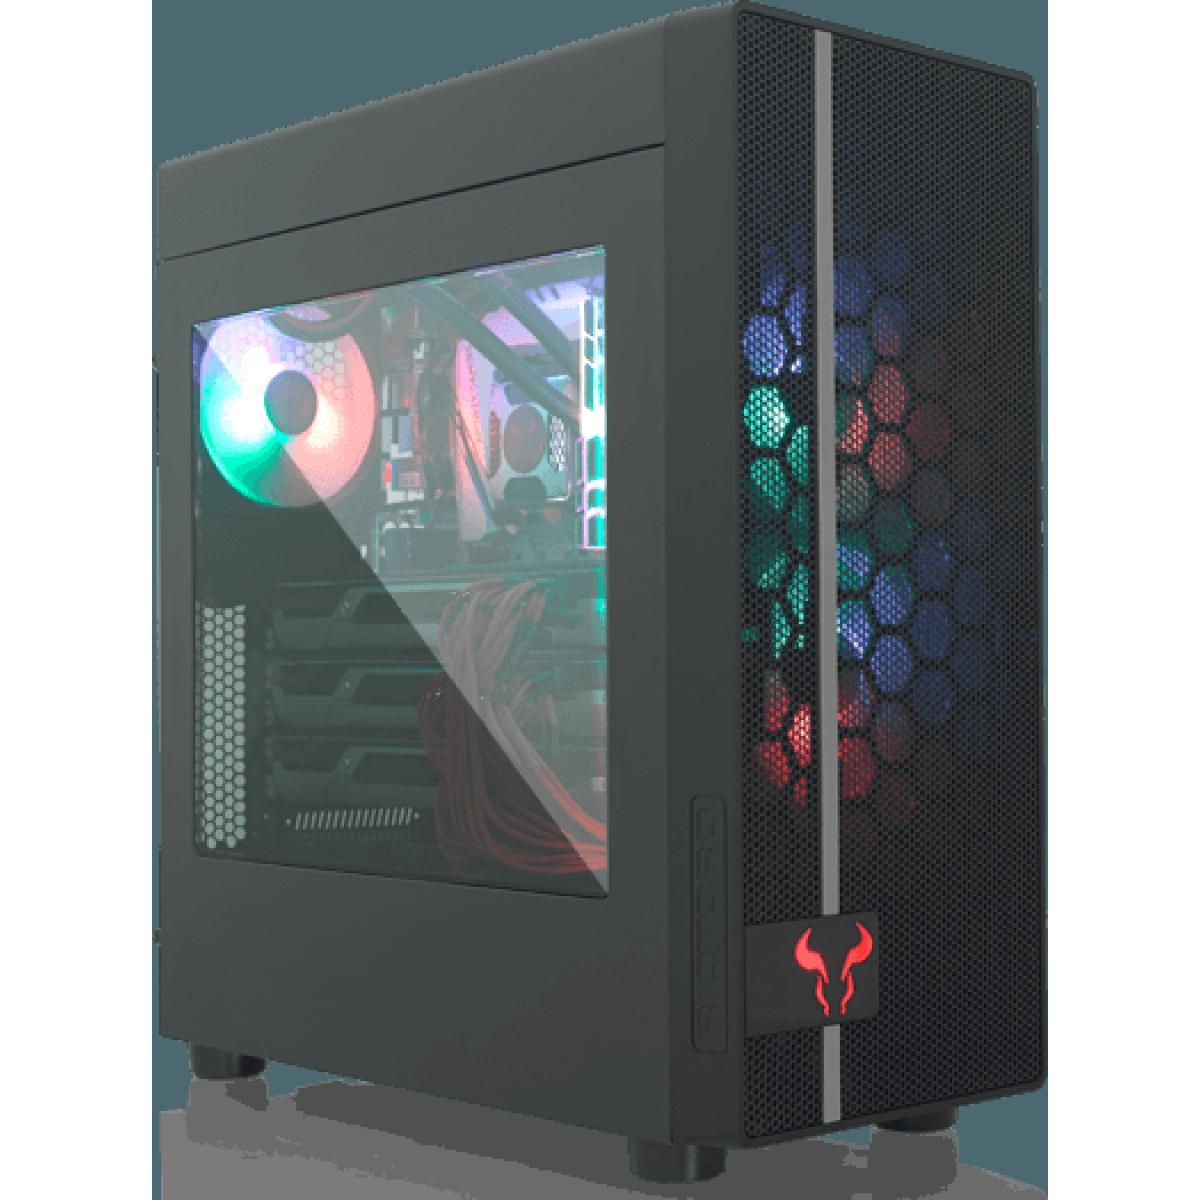 Pc Gamer T-Power Warlord Lvl-2 AMD Ryzen 7 3700X / GeForce RTX 2060 Super / DDR4 16GB / HD 1TB / 600W